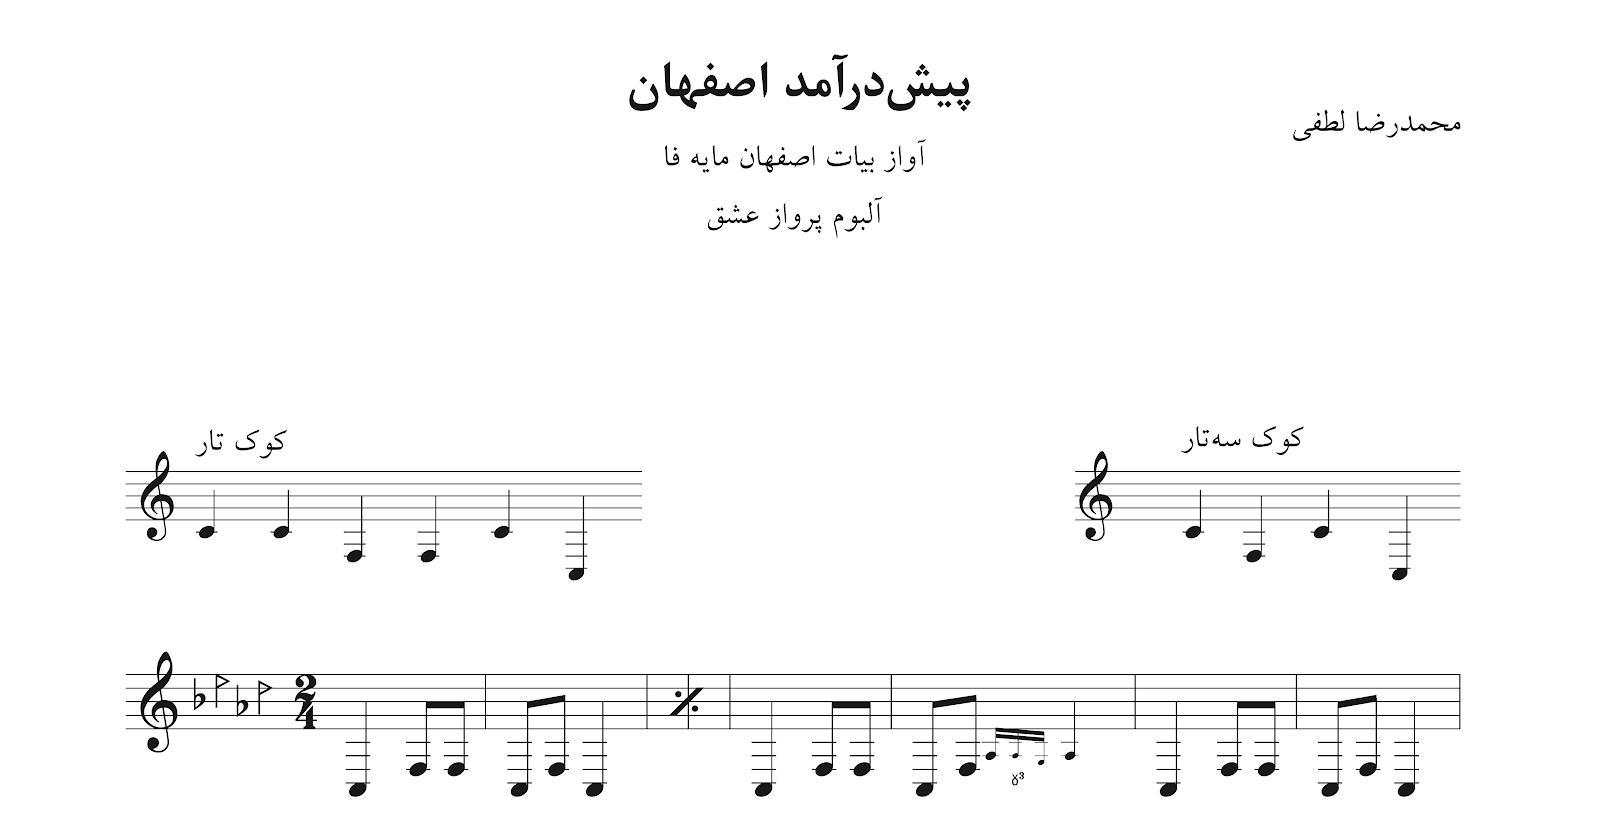 نت پیشدرآمد بیات اصفهان فا محمدرضا لطفی